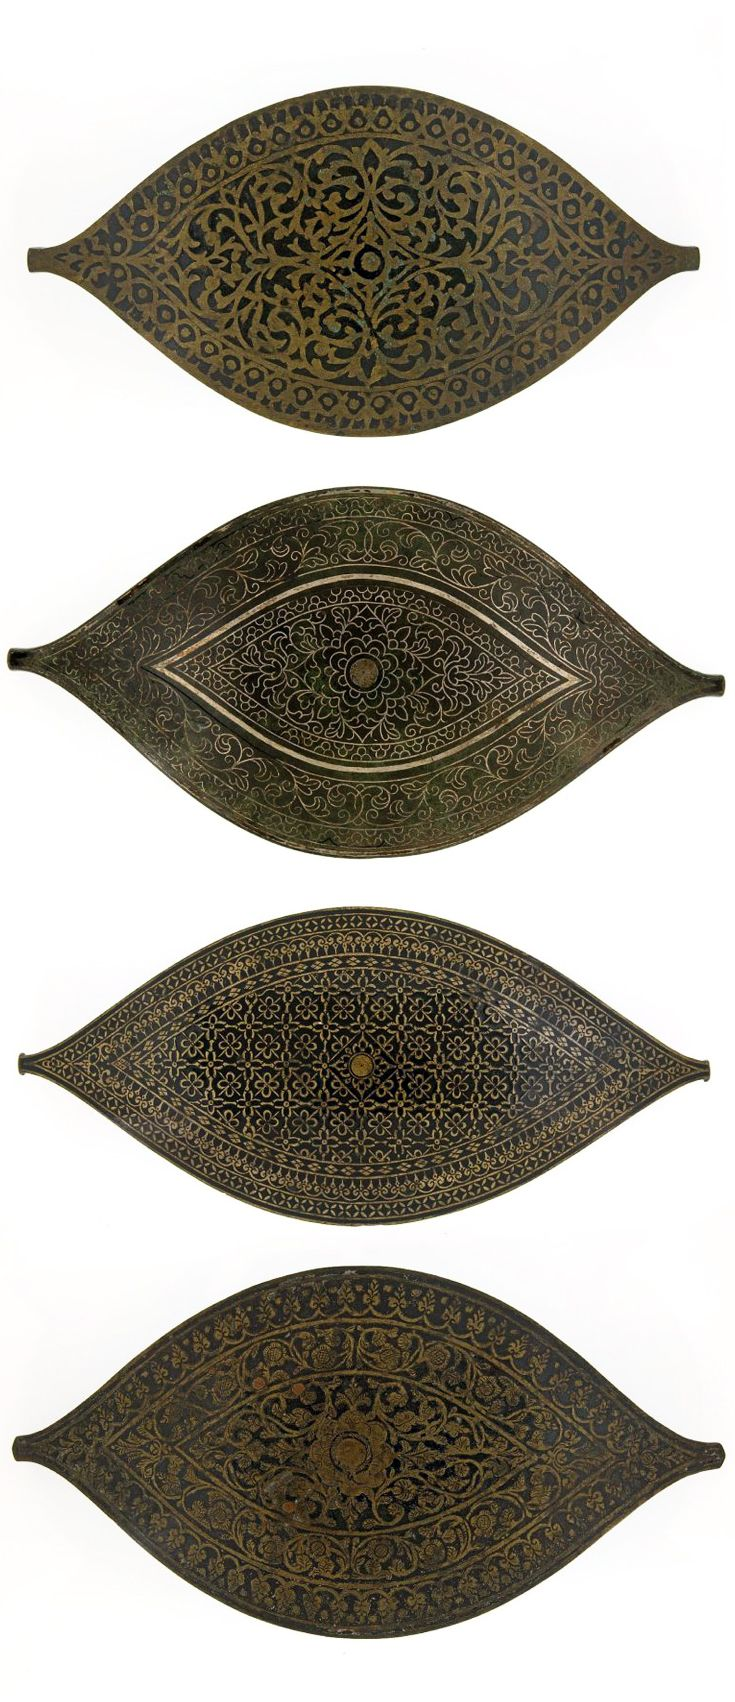 Indonesia - Sumatra, Minangkabau / Palambang | Four belt buckles (pandieëng); copper / brass alloy  | ca. 1940 or earlier